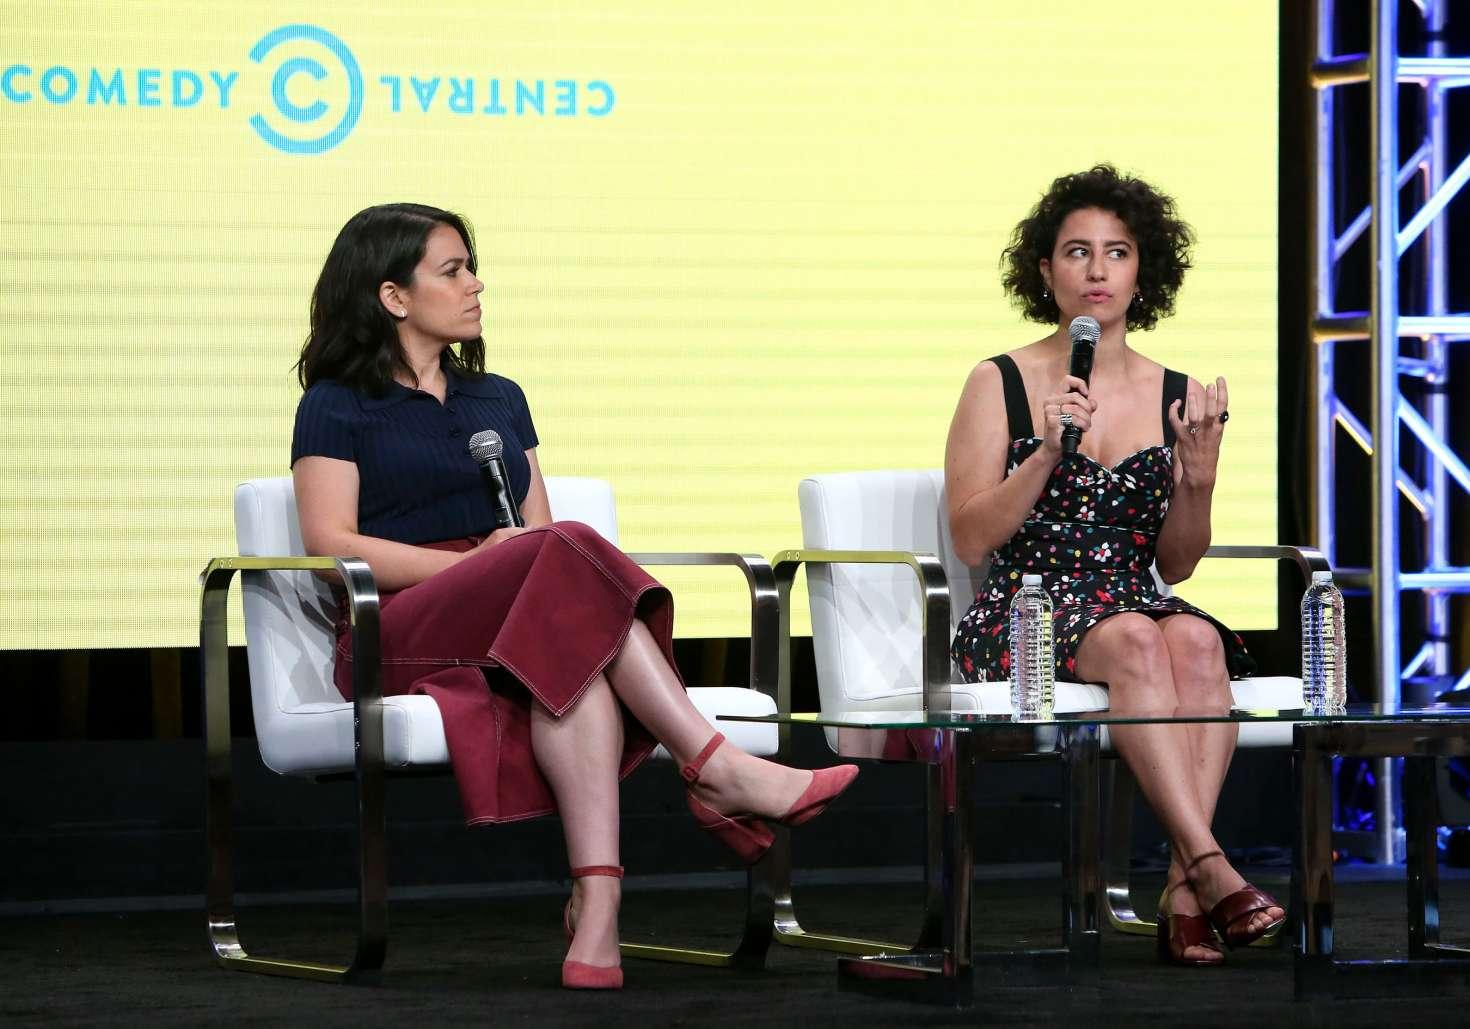 Abbi Jacobson and Ilana Glazer - 'Broad City' TV Show Panel at 2017 TCA Summer Press Tour in LA